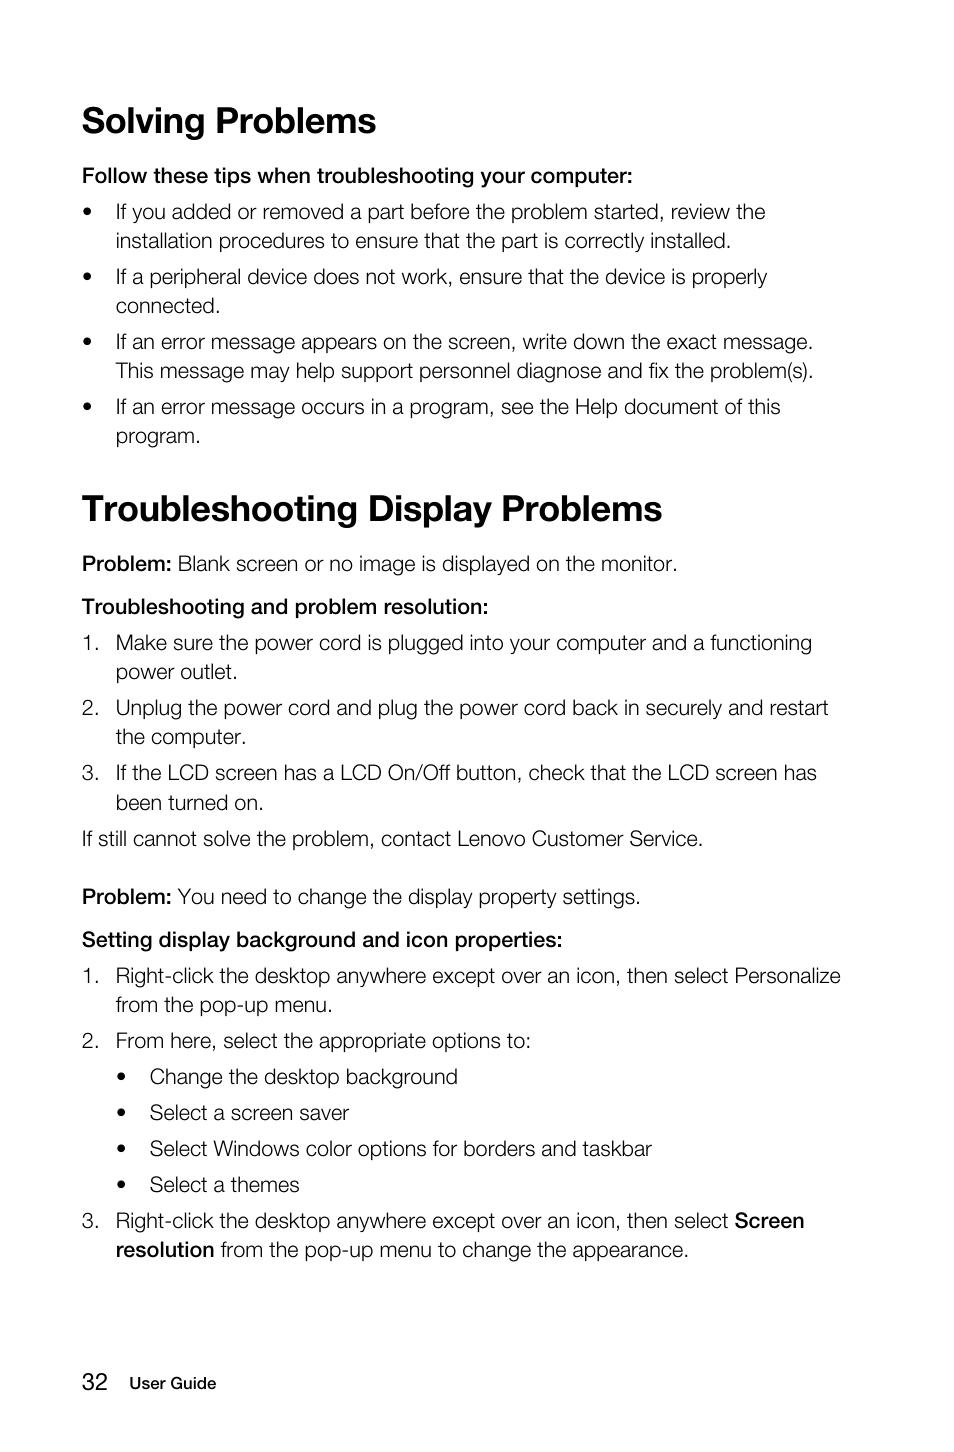 troubleshooting display problems solving problems lenovo b50 30 rh manualsdir com lenovo tablet troubleshooting guide lenovo phone troubleshooting guide